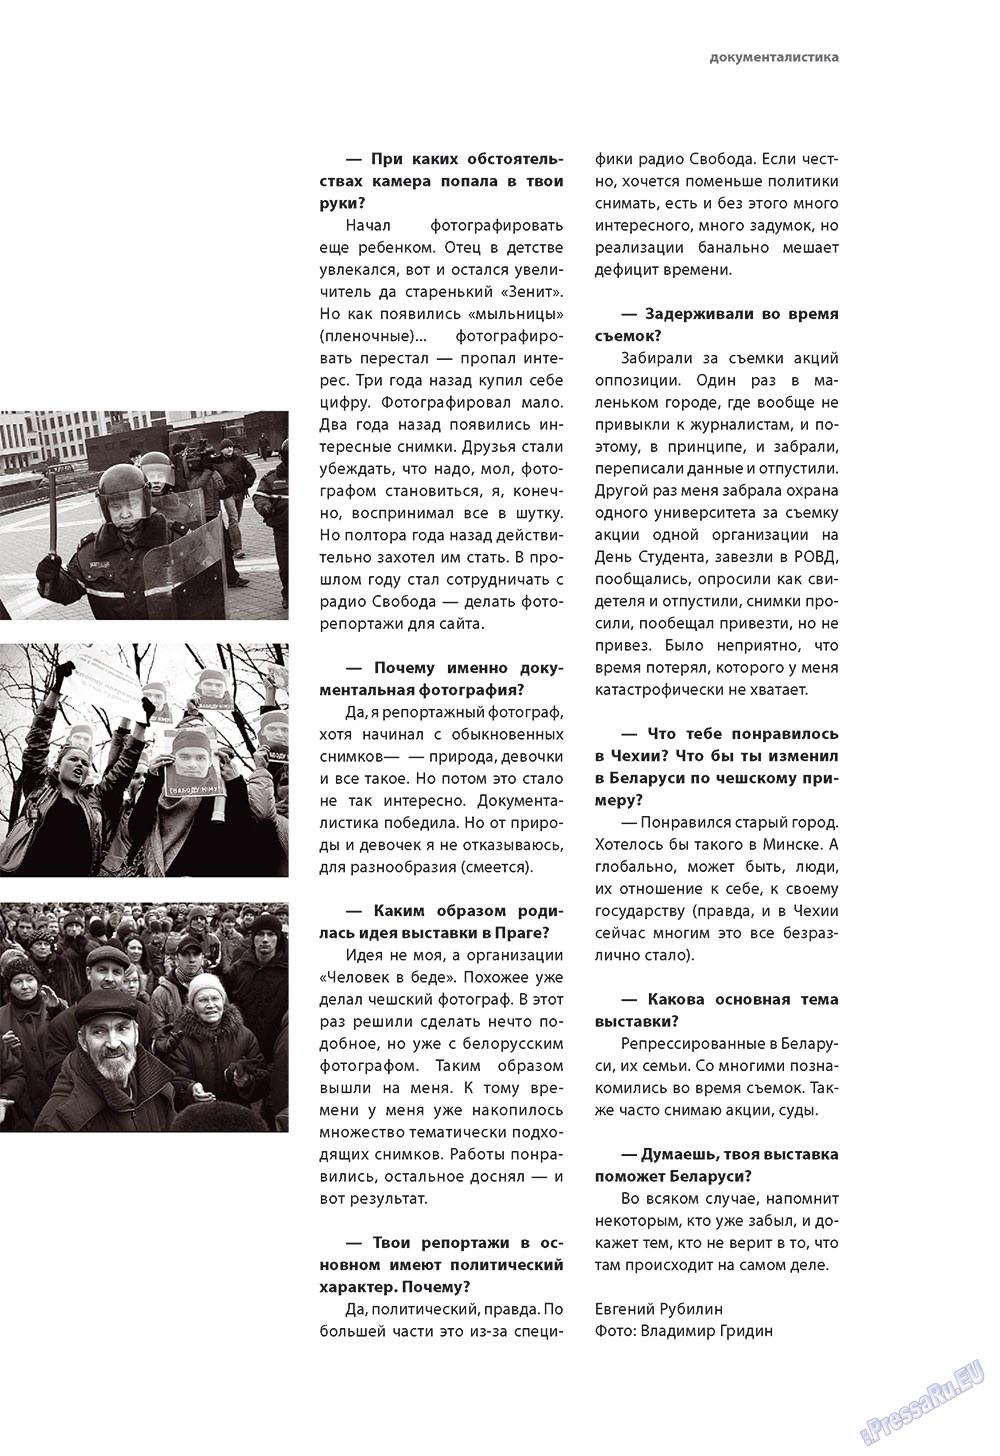 Артек (журнал). 2009 год, номер 5, стр. 5